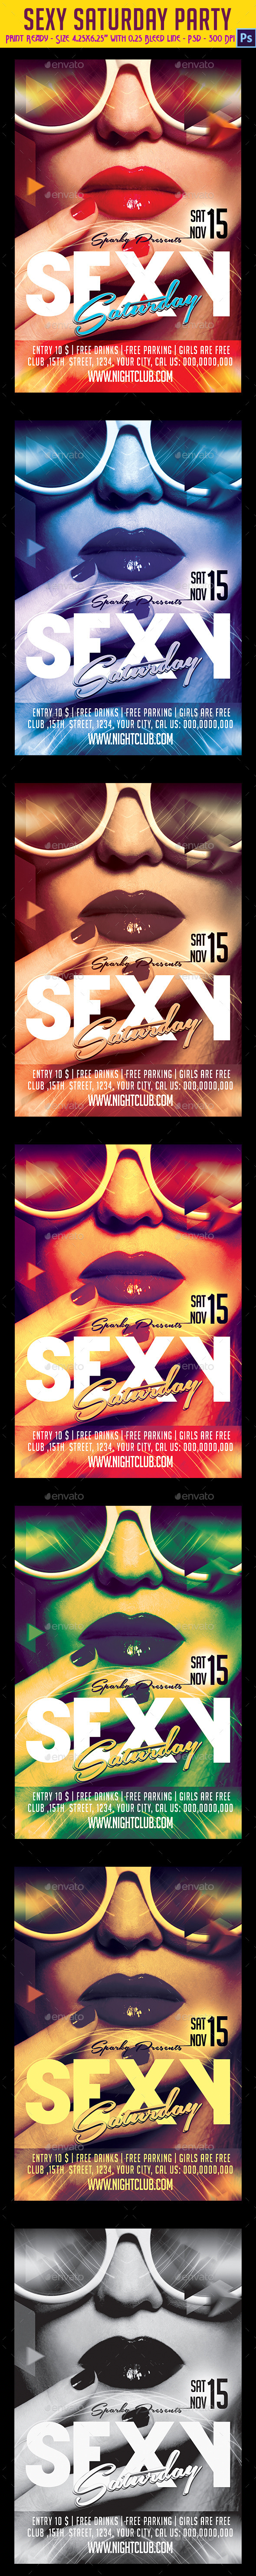 Sexy Saturdays Party Flyer